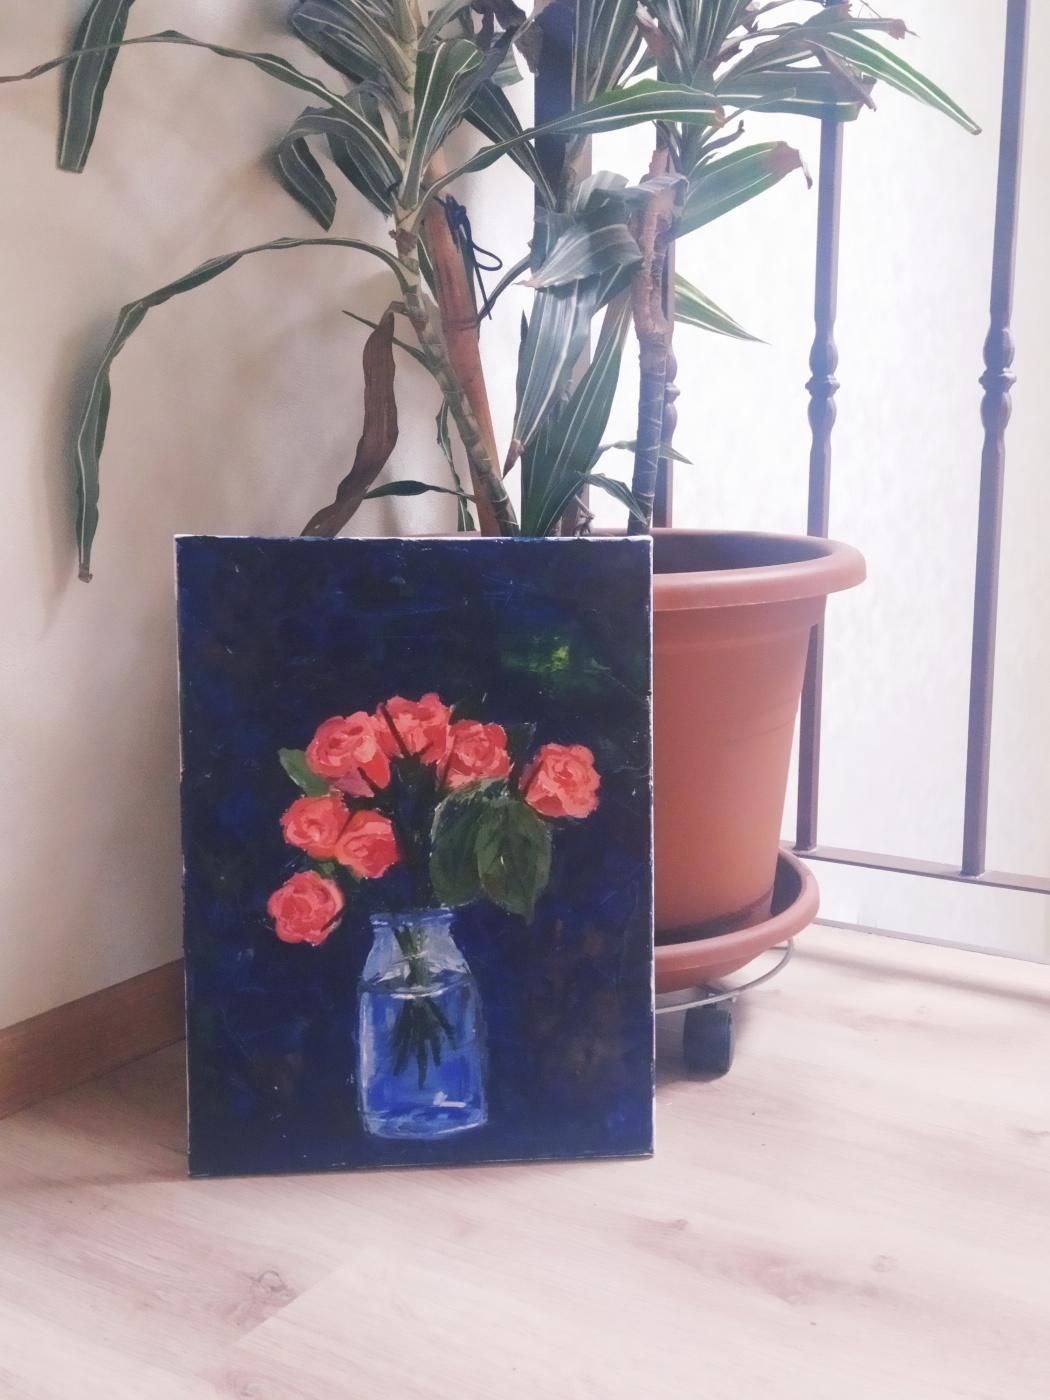 Margo Ddd Haretty. Lonely roses